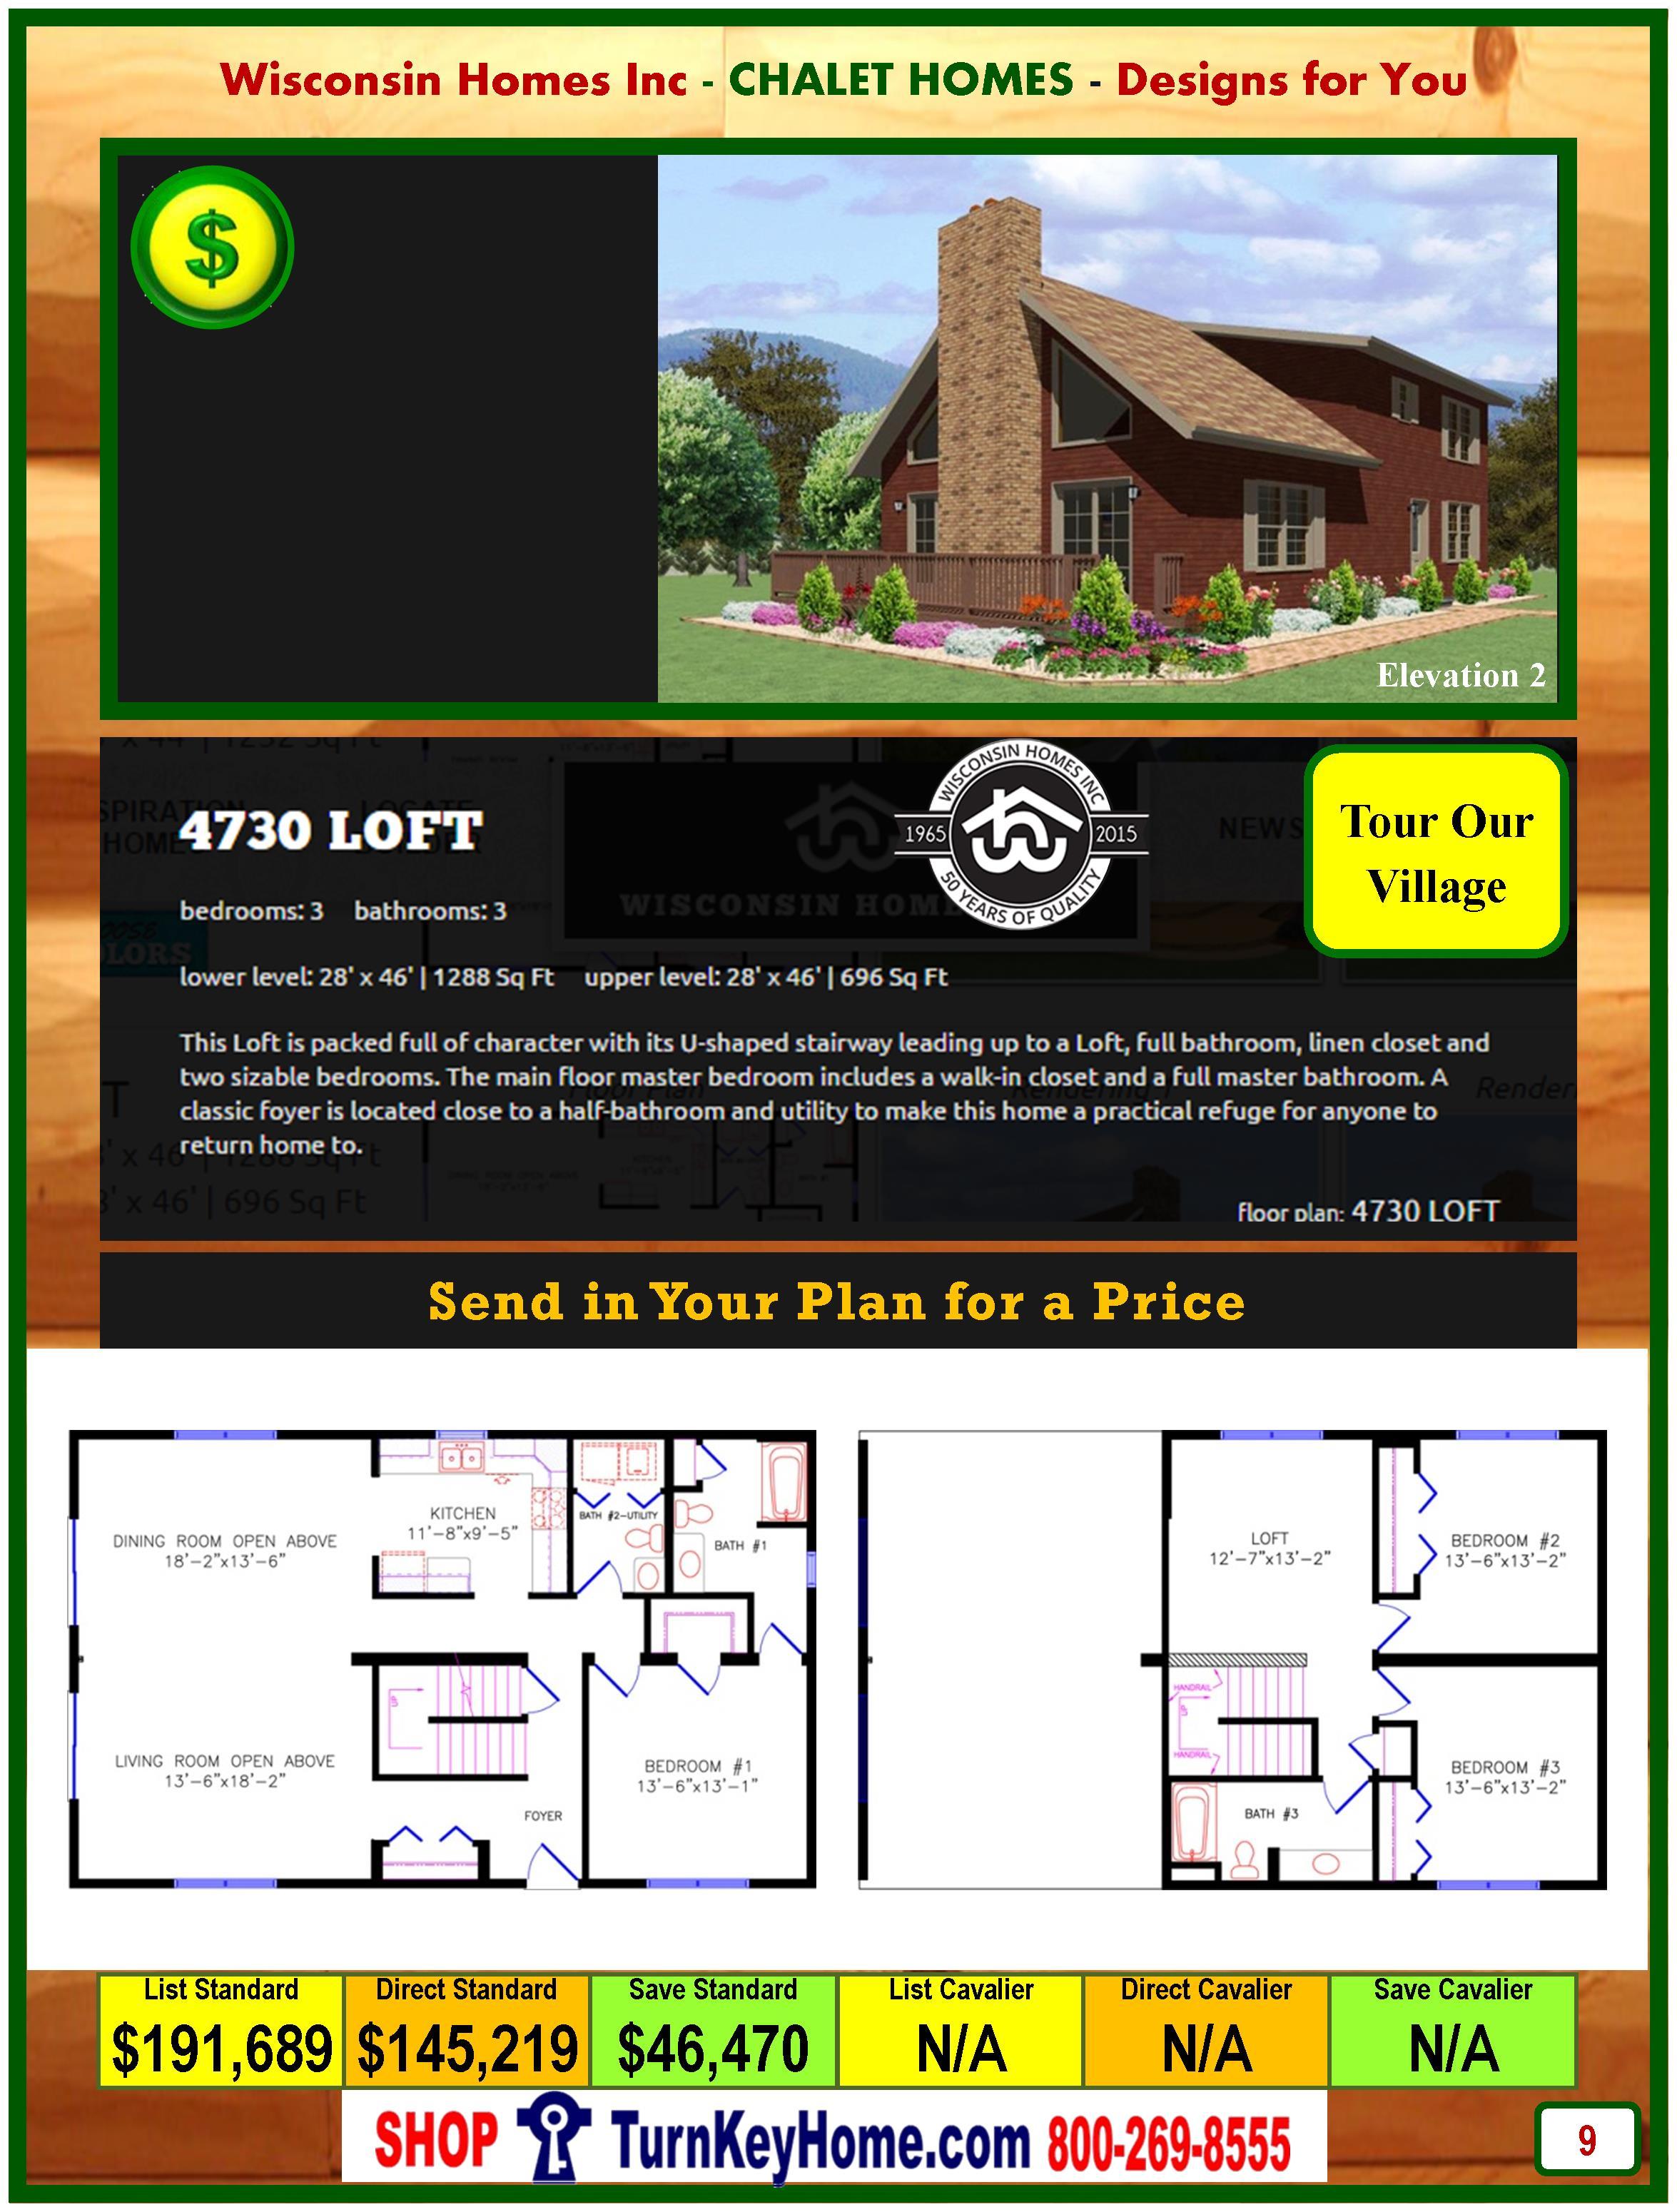 Modular.Home.Catalog.Wisconsin.Homes.Inc.Chalet.Loft.4730.P9.2.1215